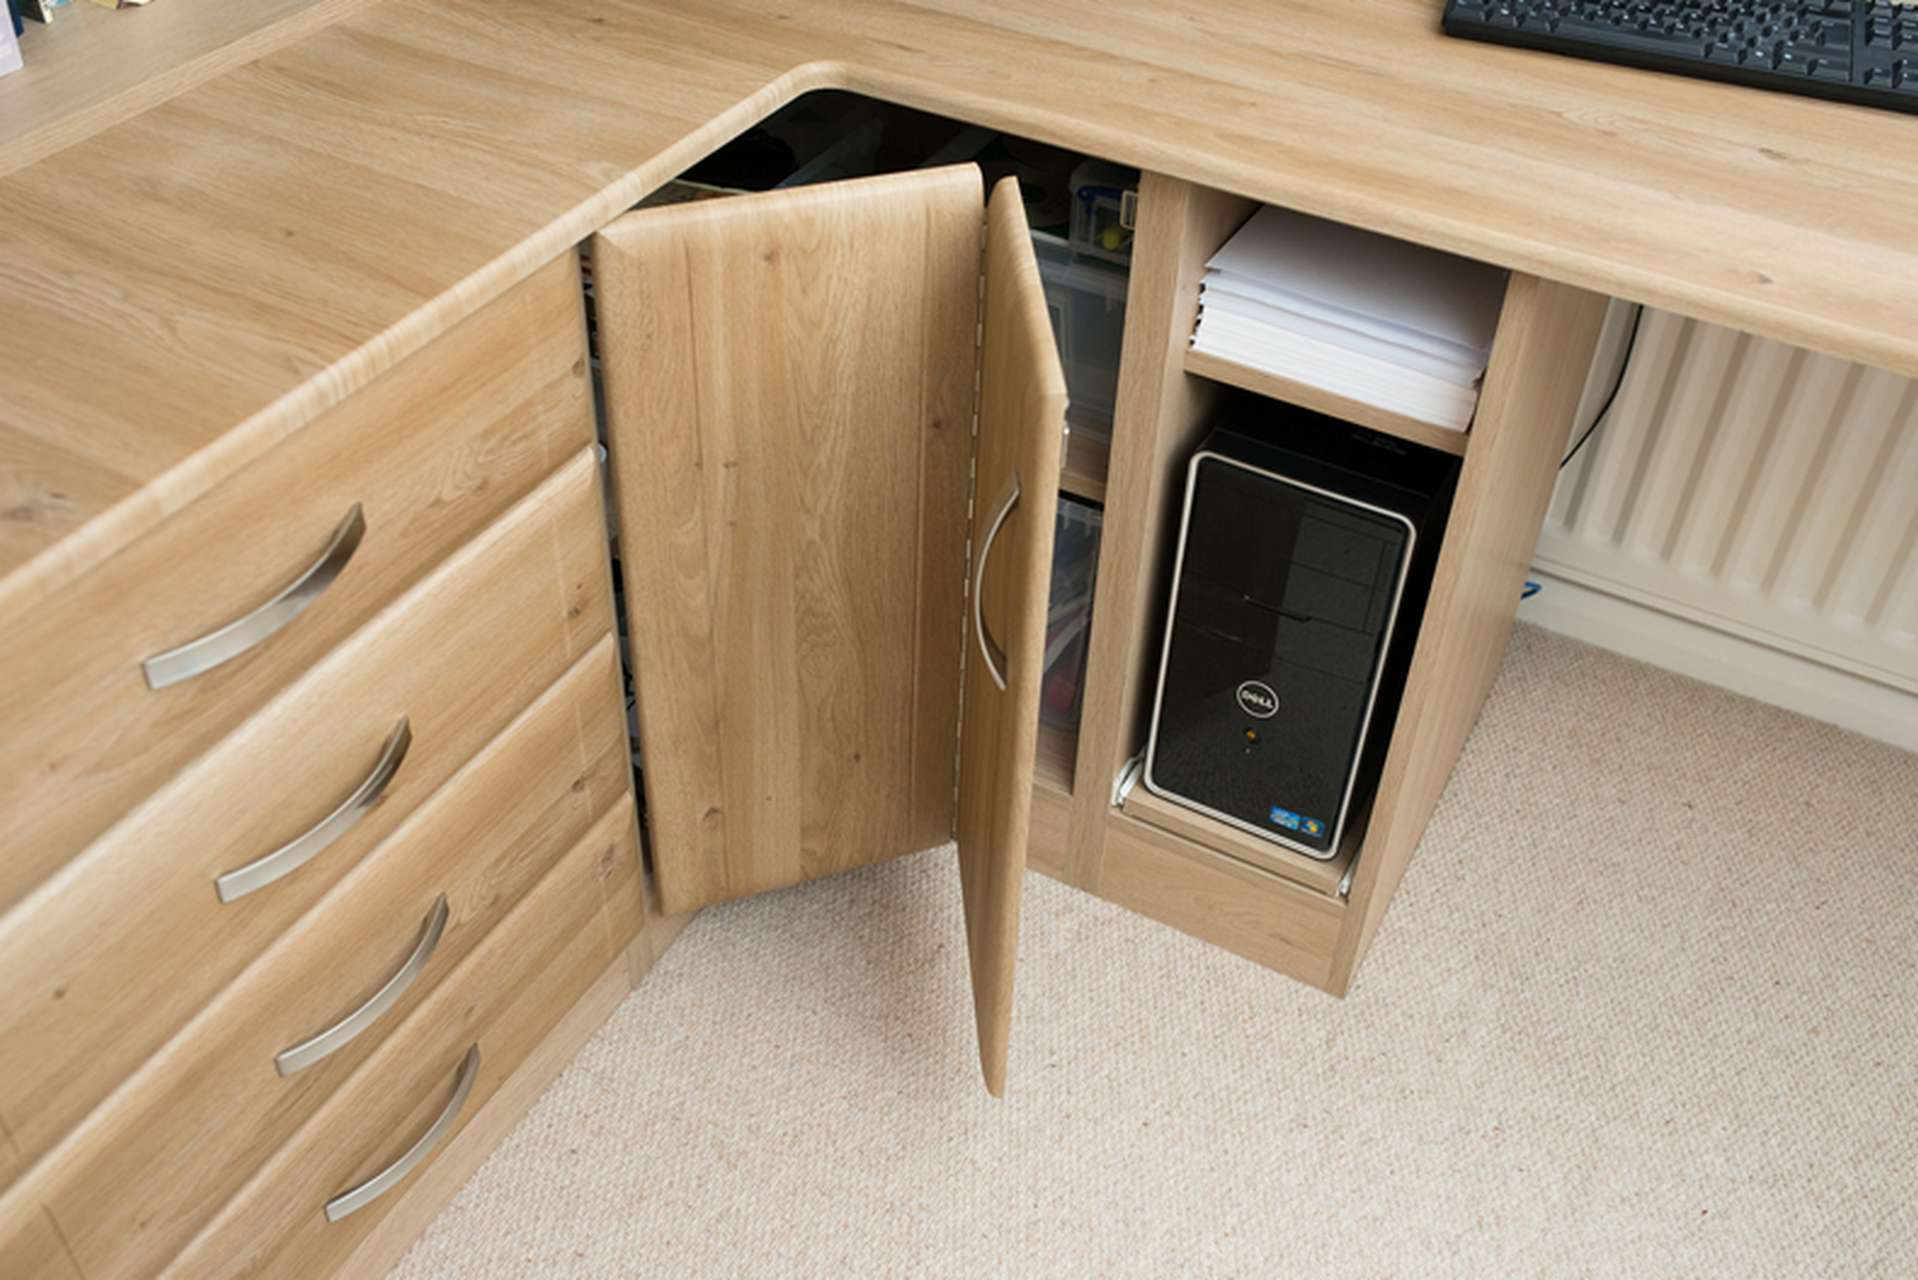 Computer storage and corner cupboard